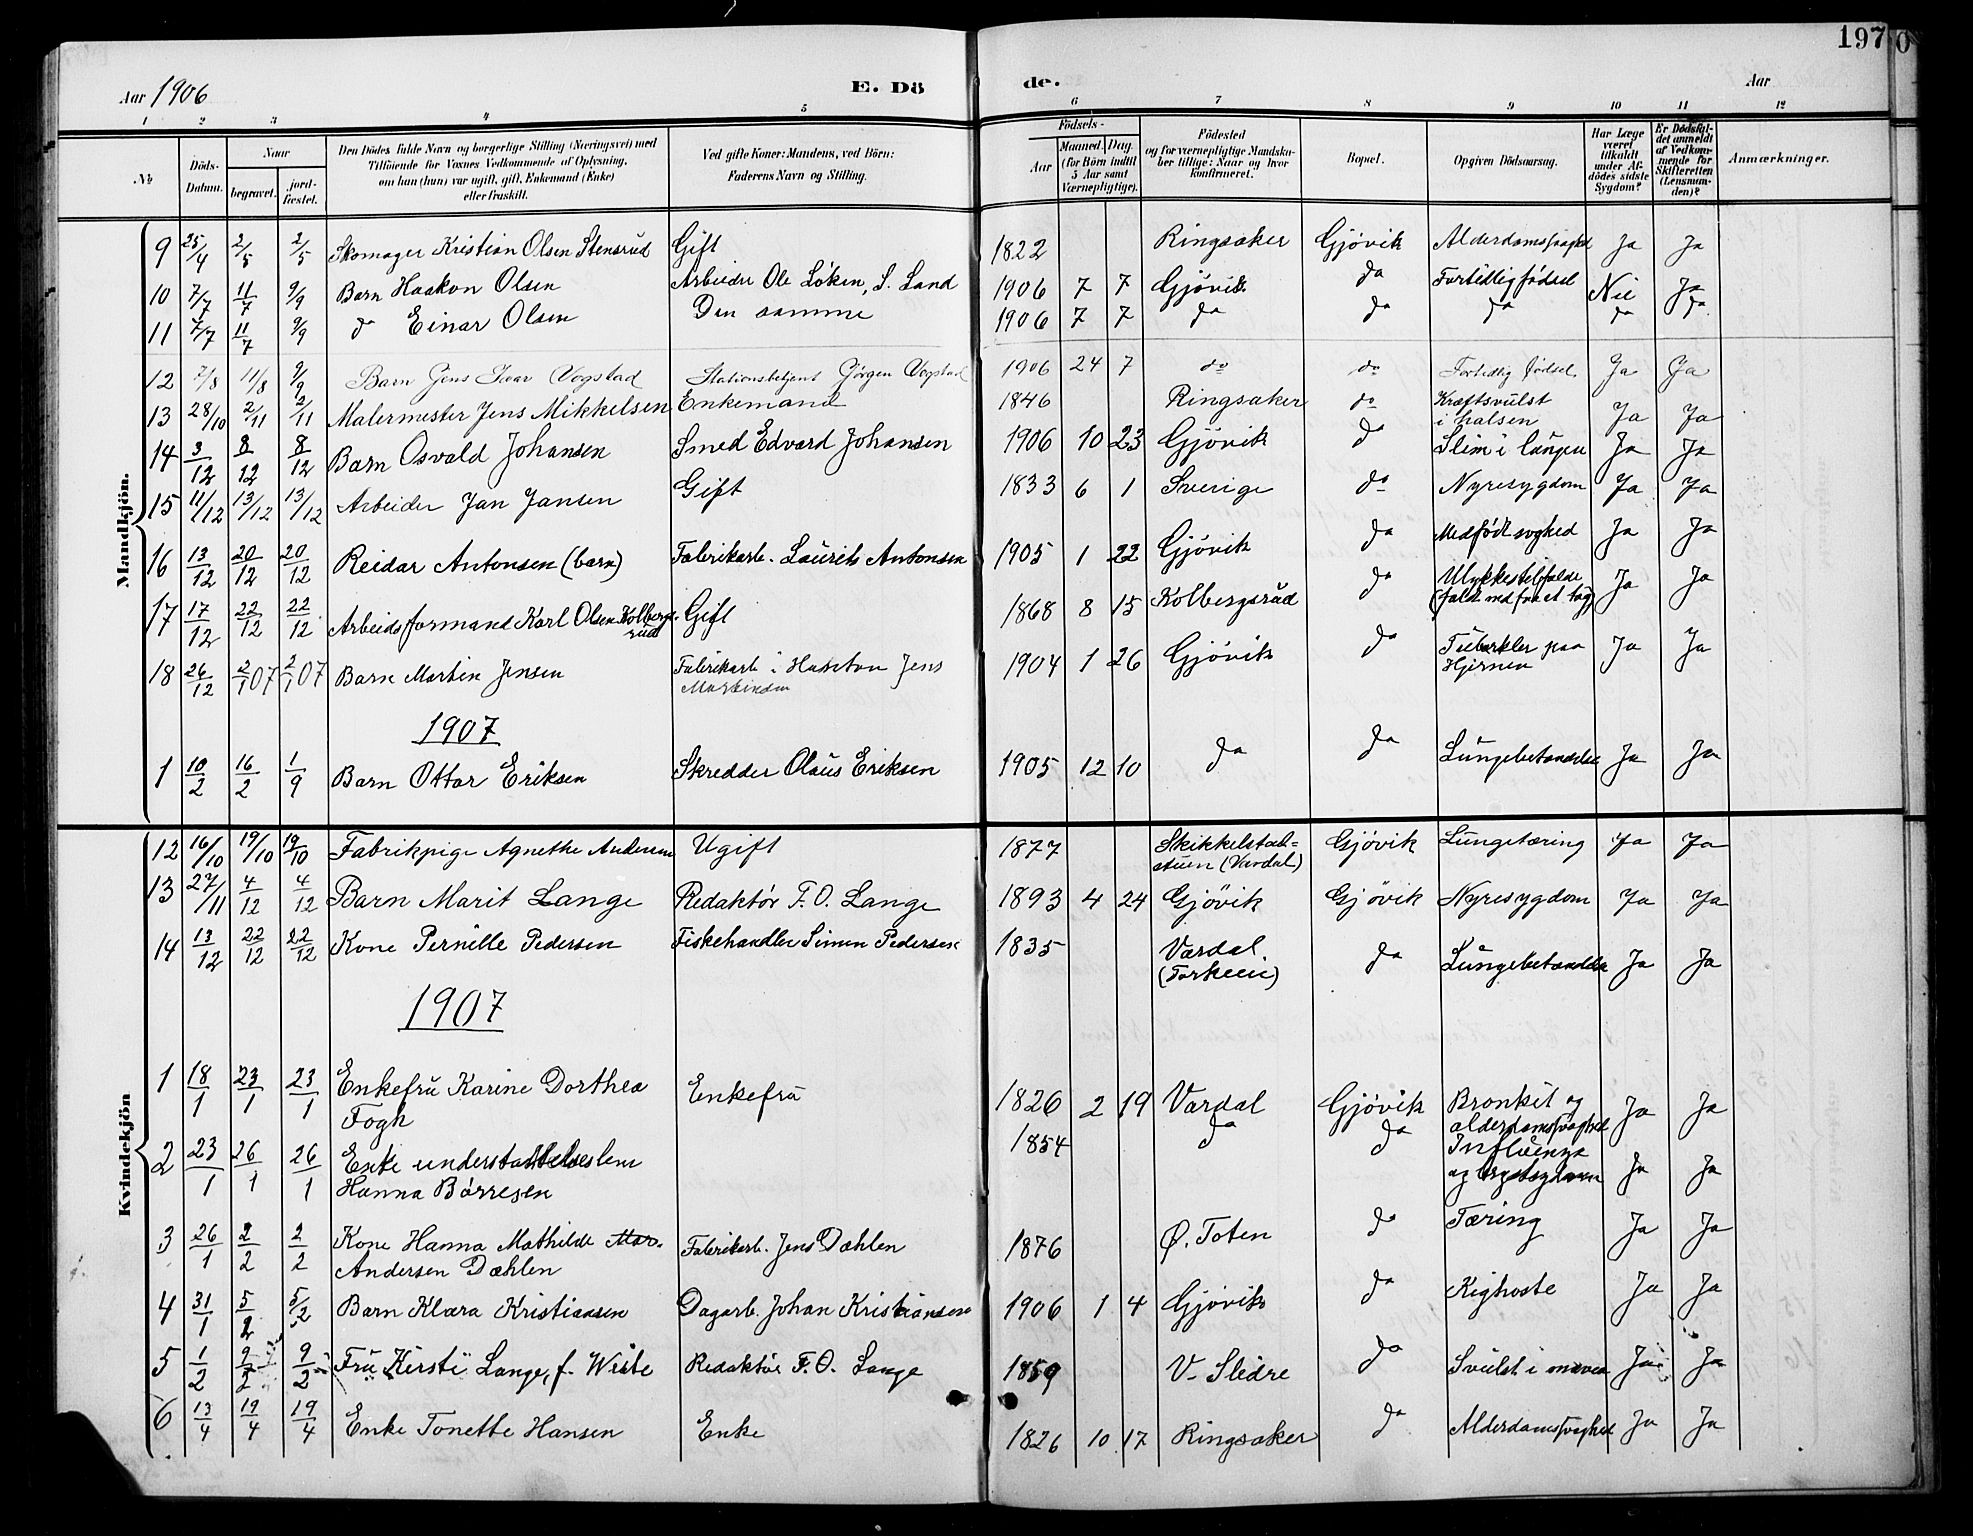 SAH, Vardal prestekontor, H/Ha/Hab/L0012: Klokkerbok nr. 12, 1902-1911, s. 197